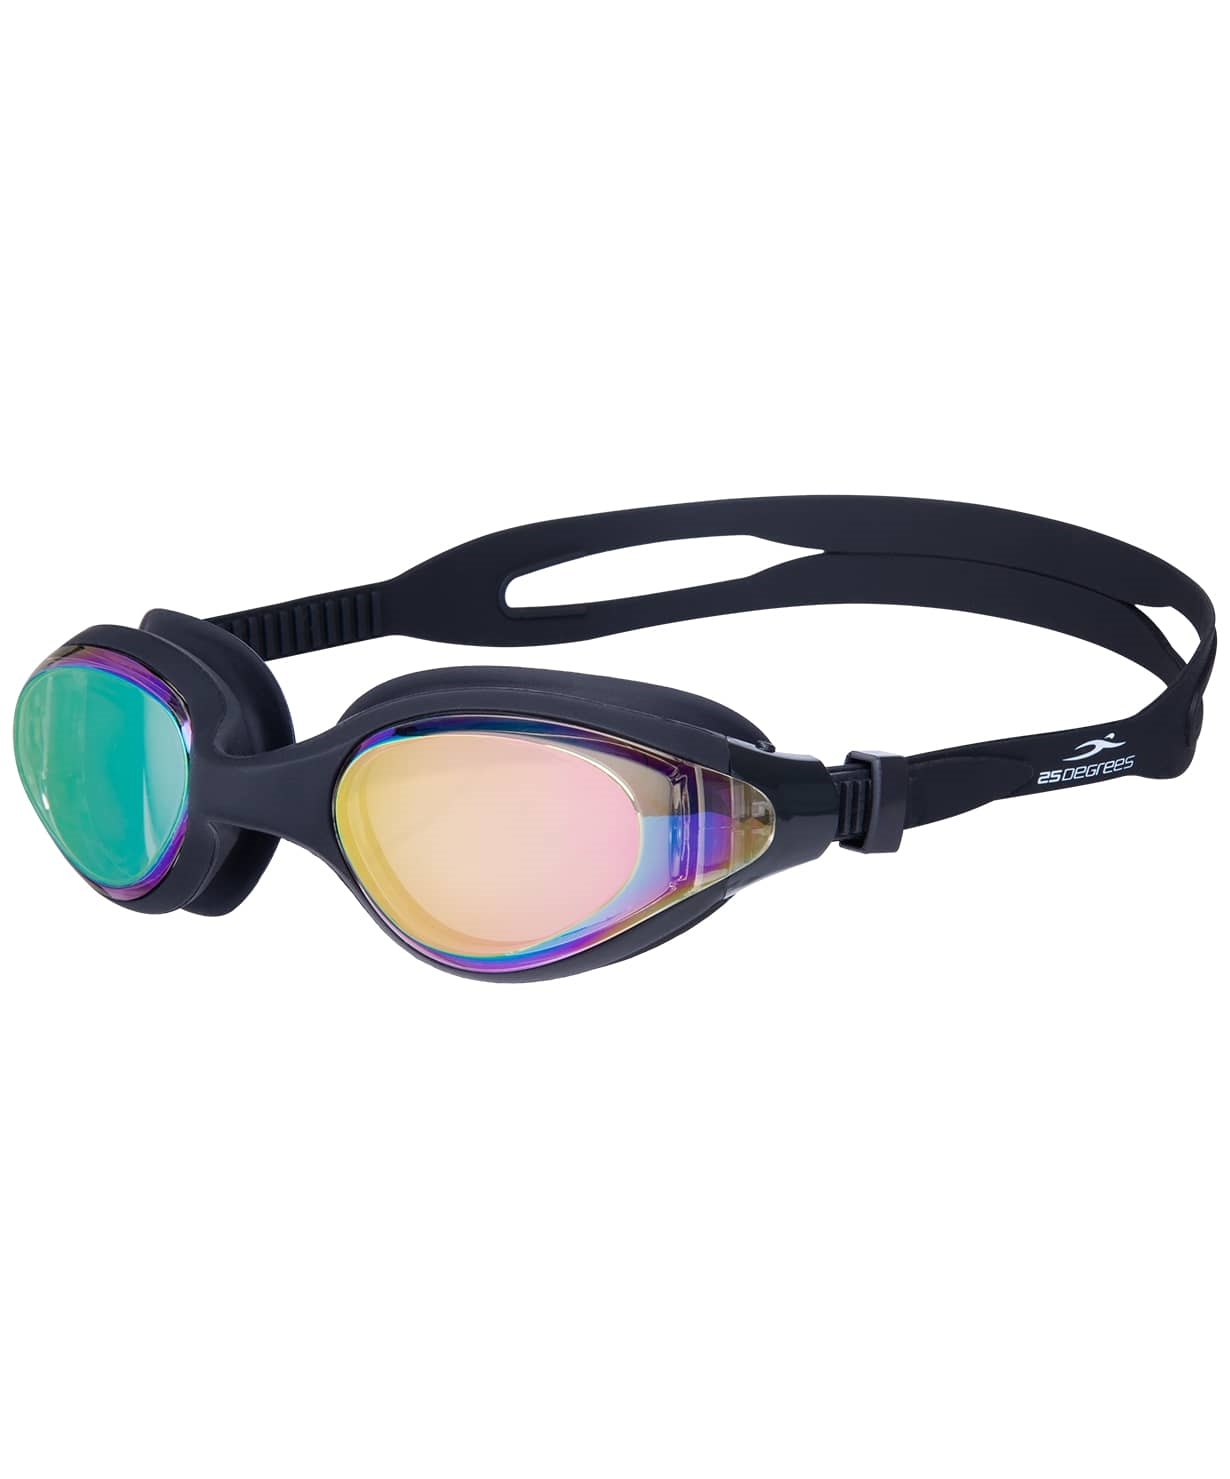 Очки для плавания Prive Mirrored Black